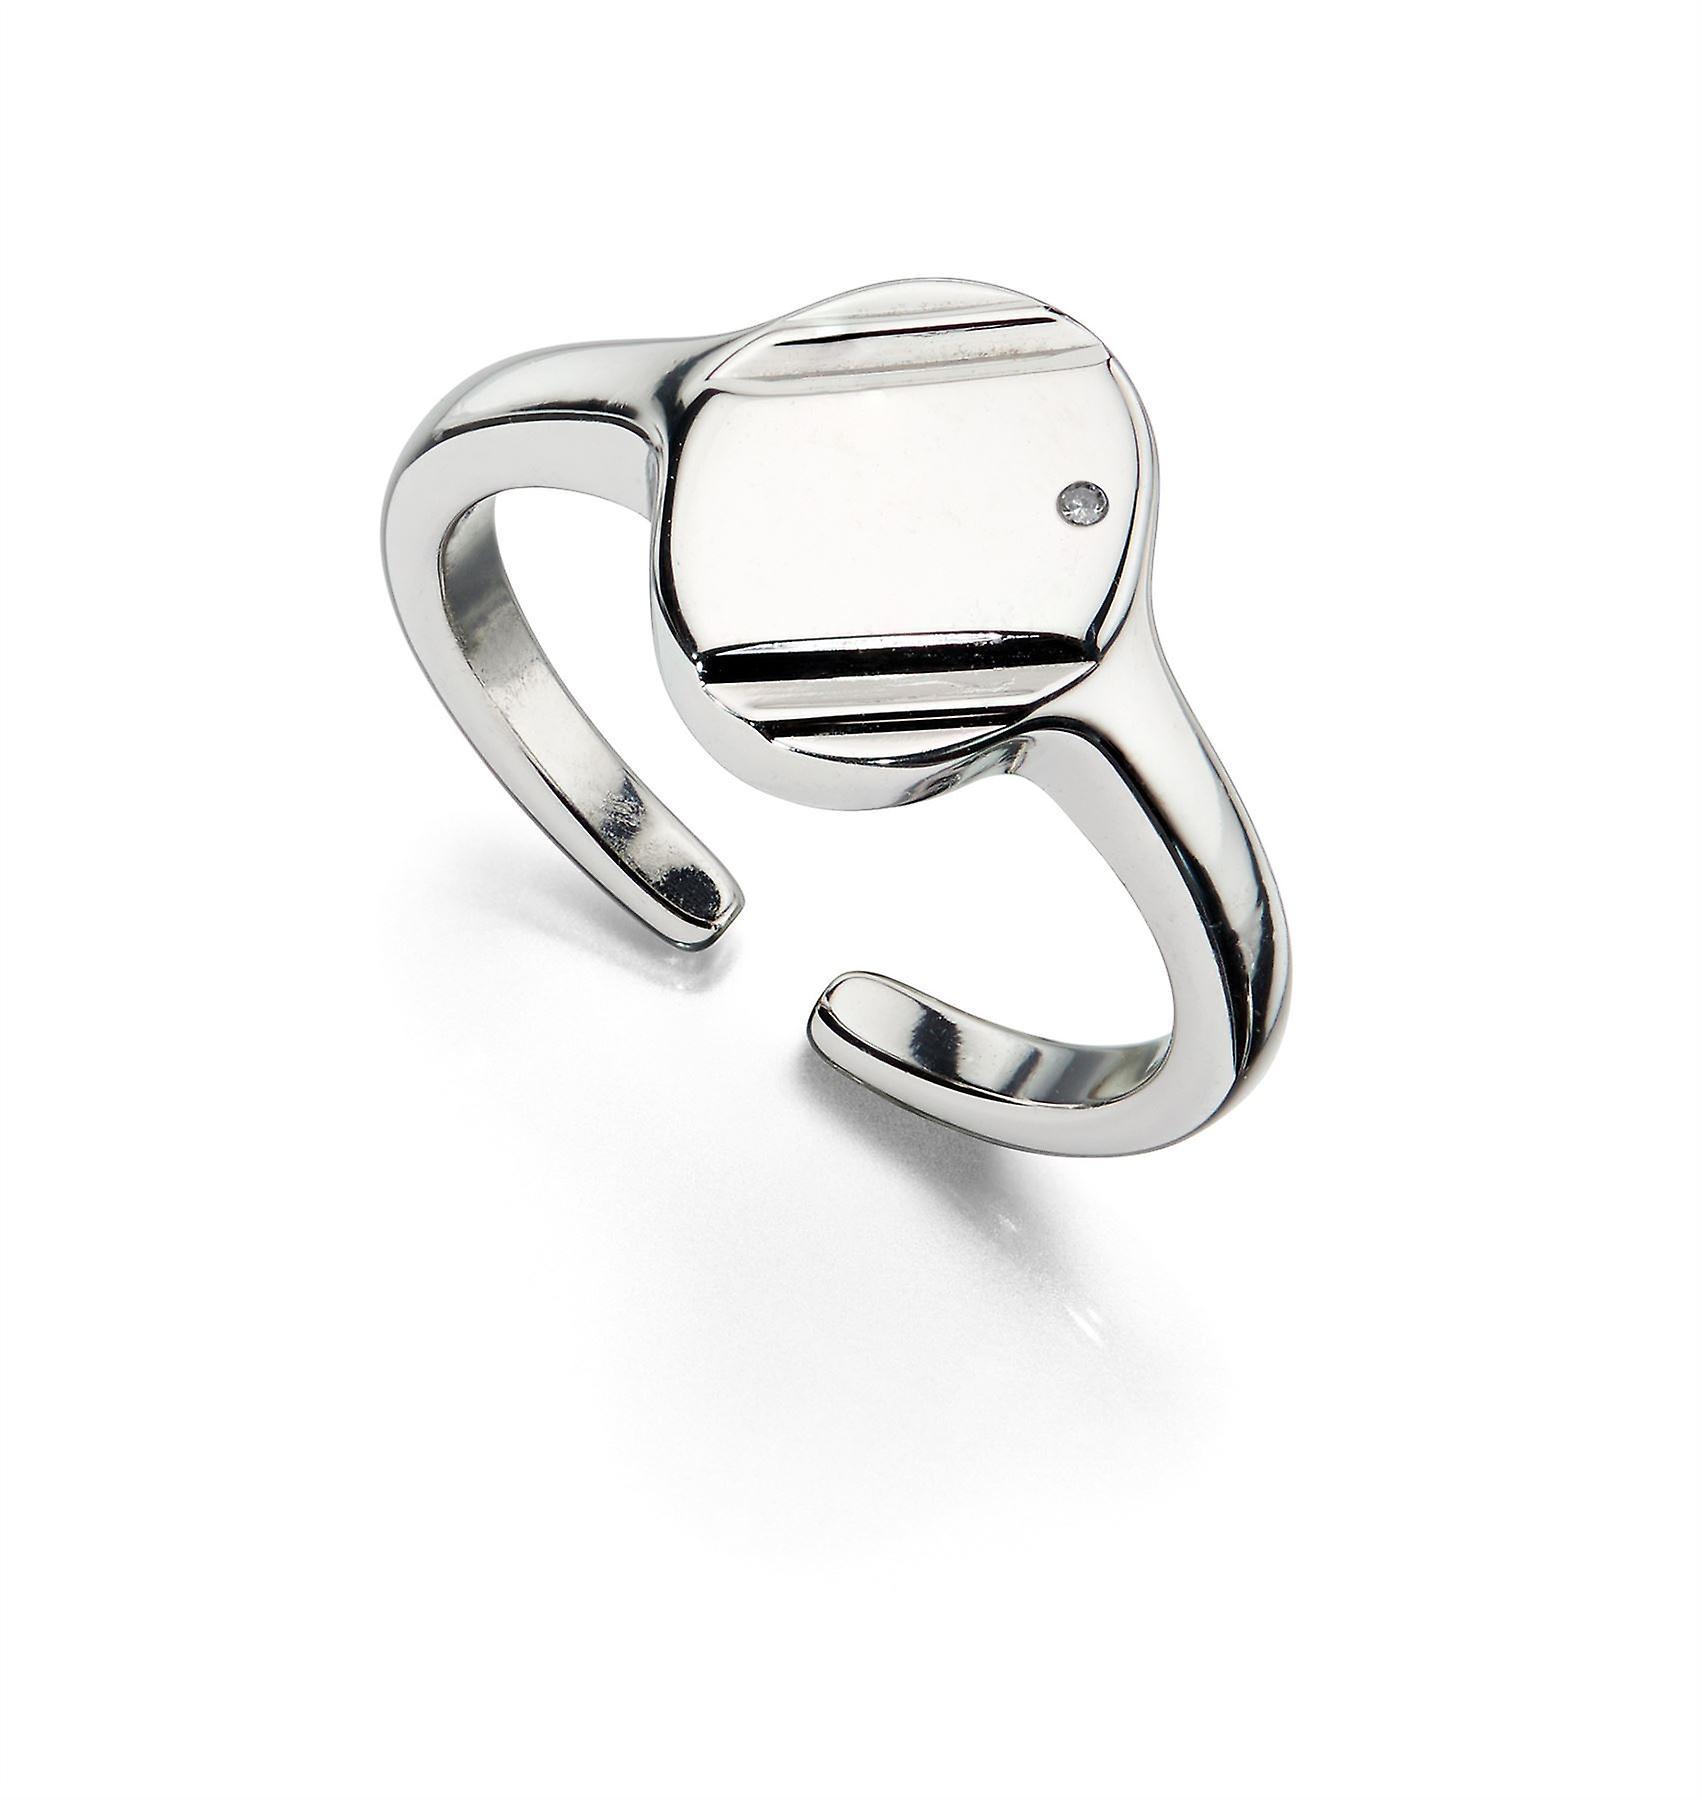 D For Diamond - Signet sacue